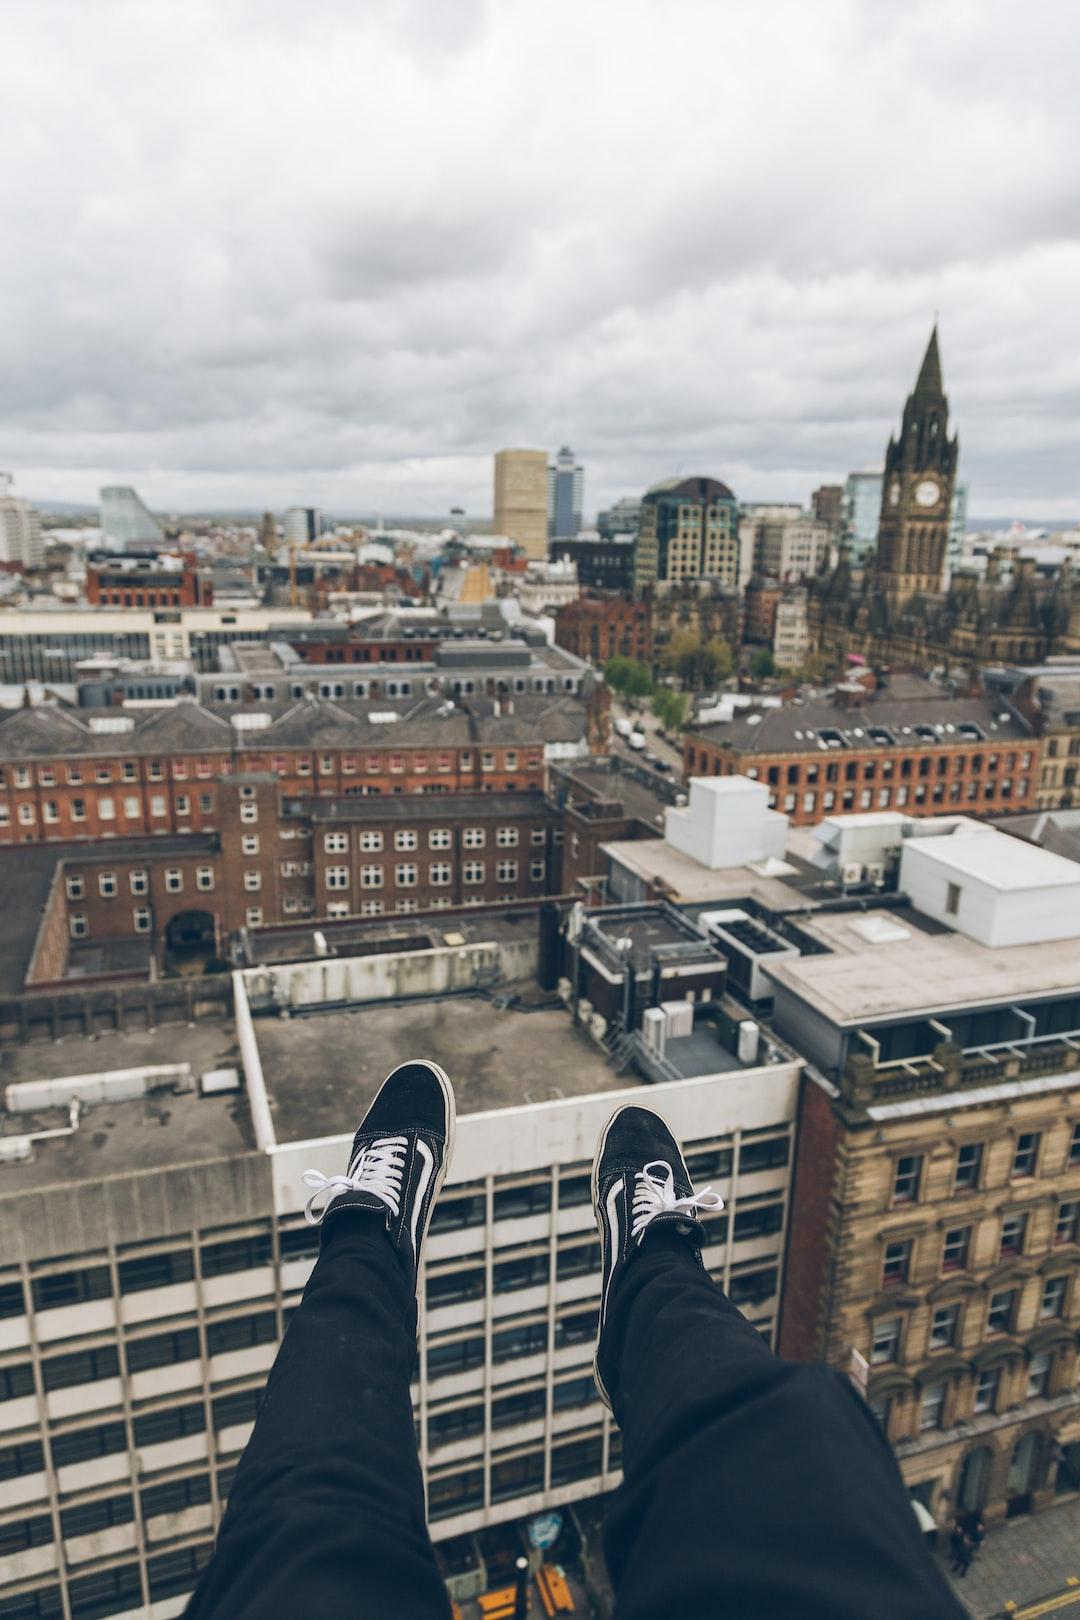 Feet off the edge